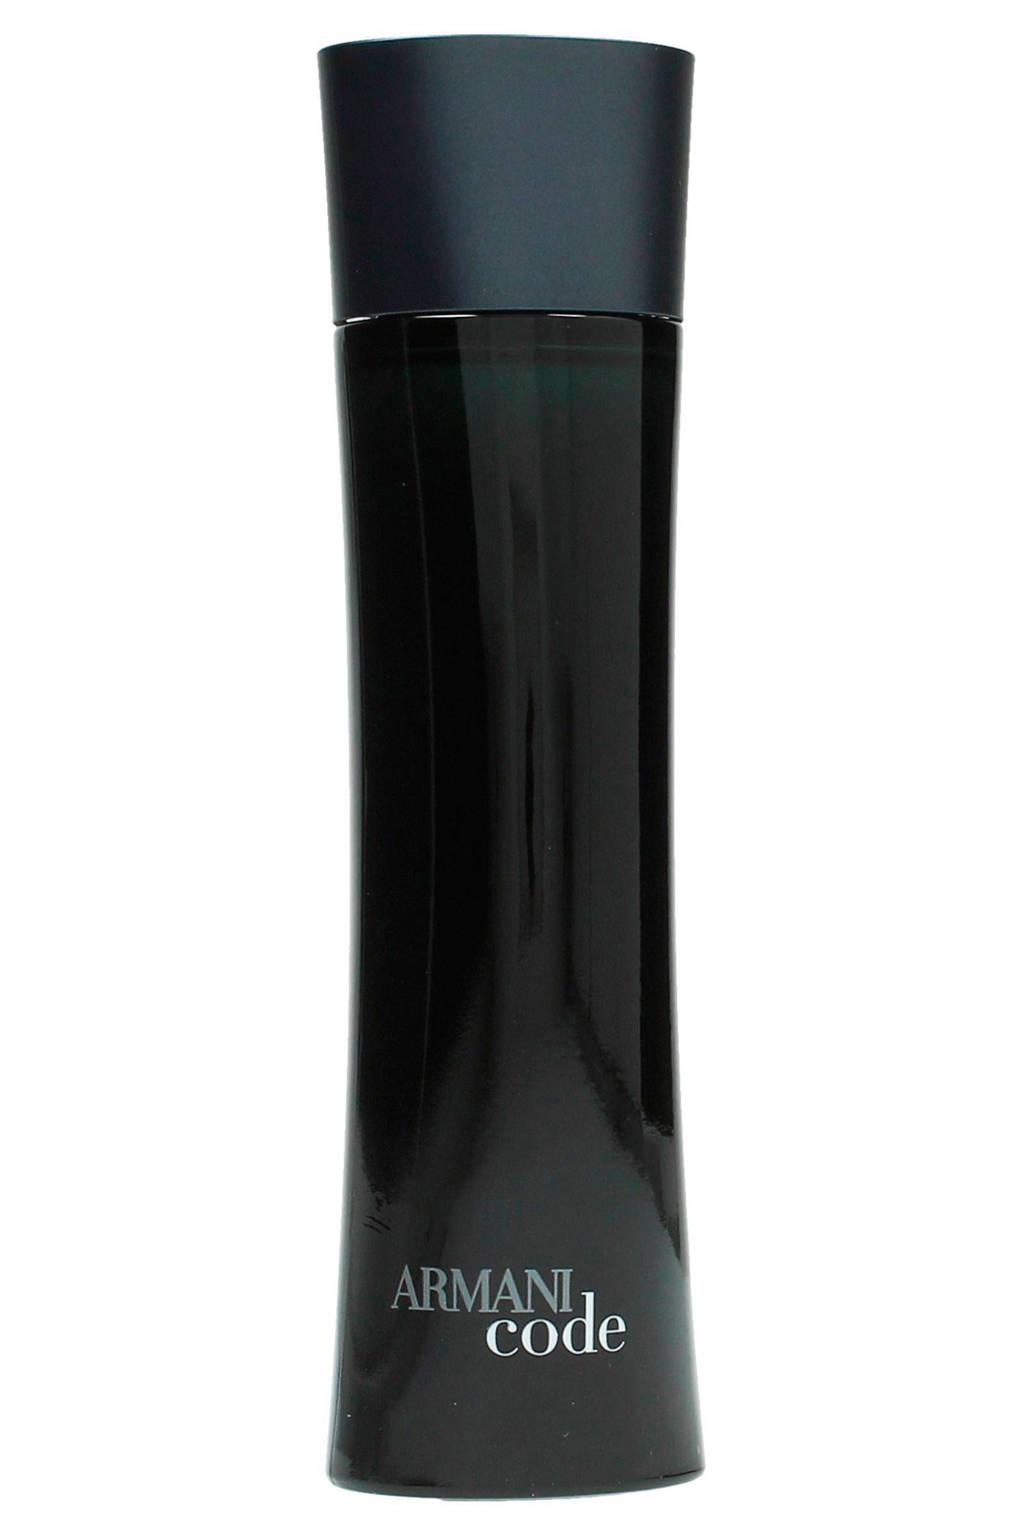 Giorgio Armani Code Pour Homme eau de toilette - 125 ml, Heren